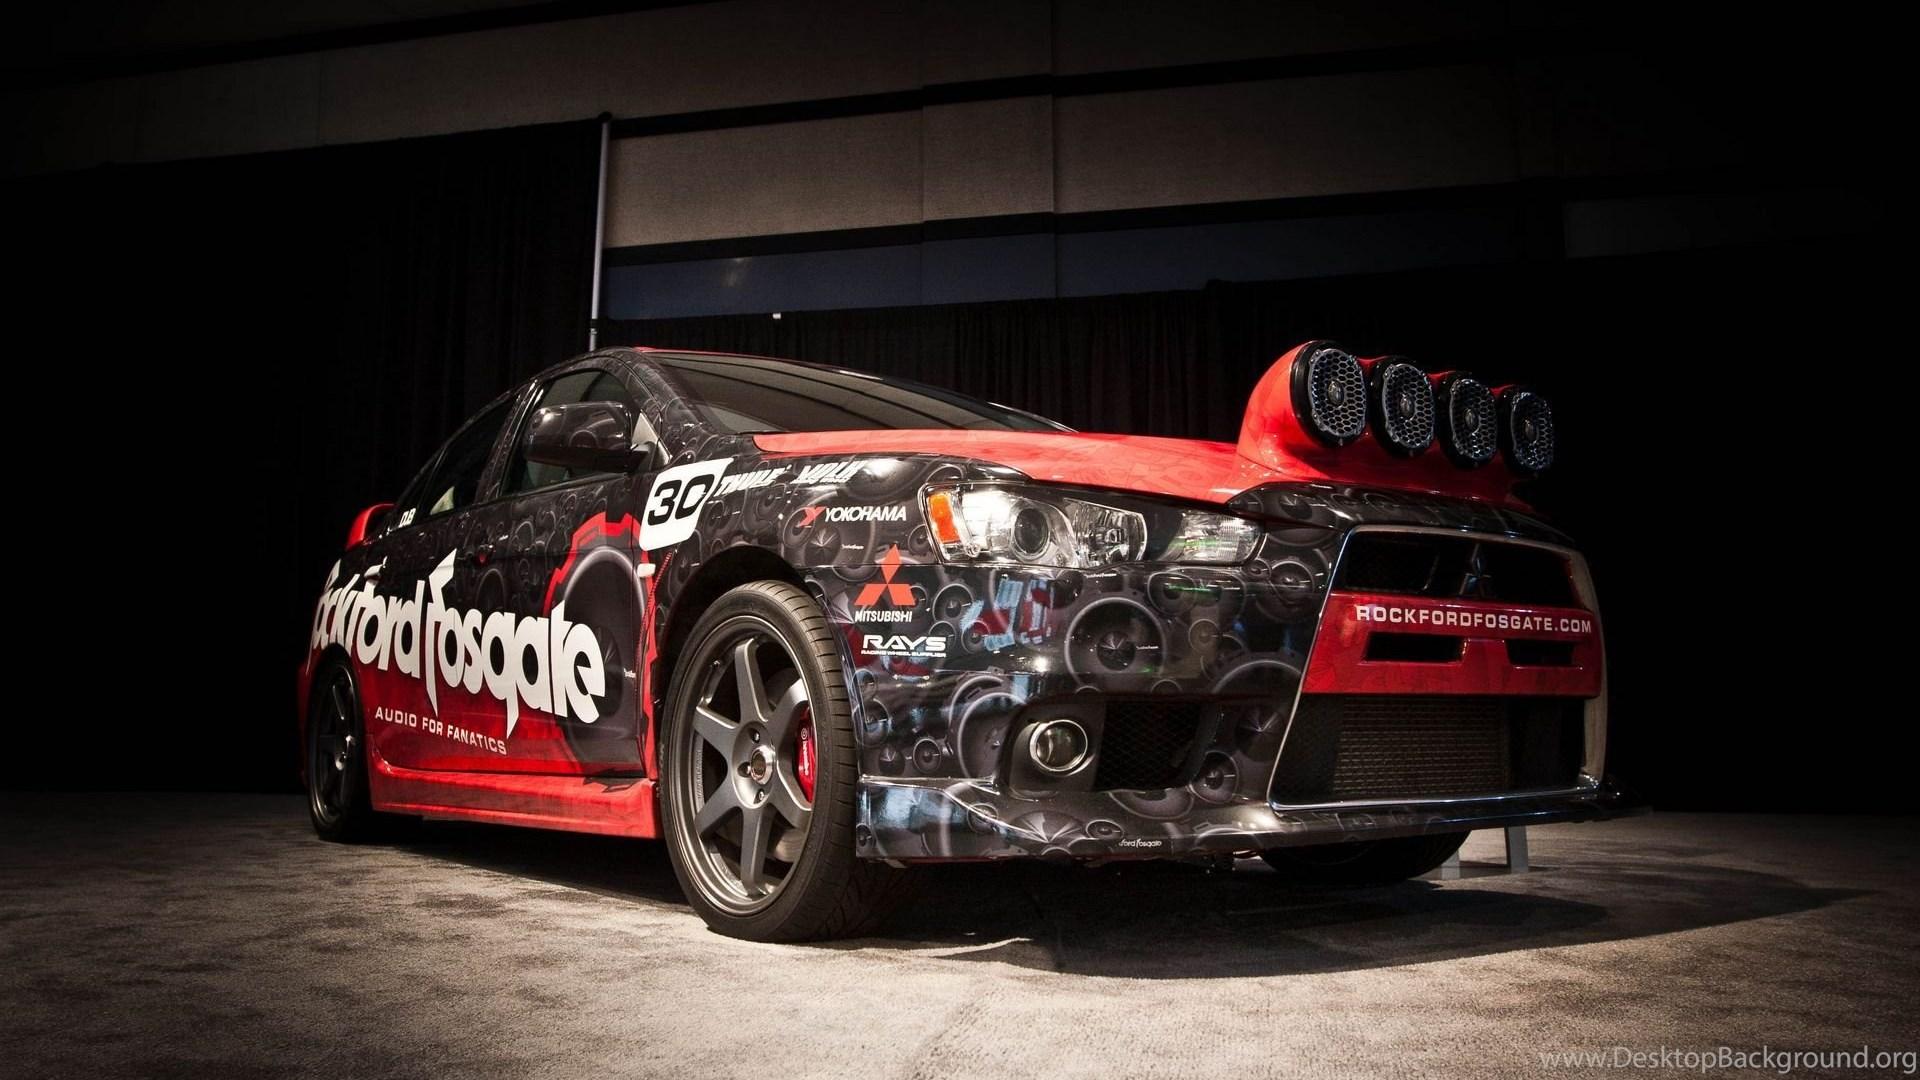 Mitsubishi Evo Rockford Fosgate Rally Edition At 2012 Los Angeles Hd Popular